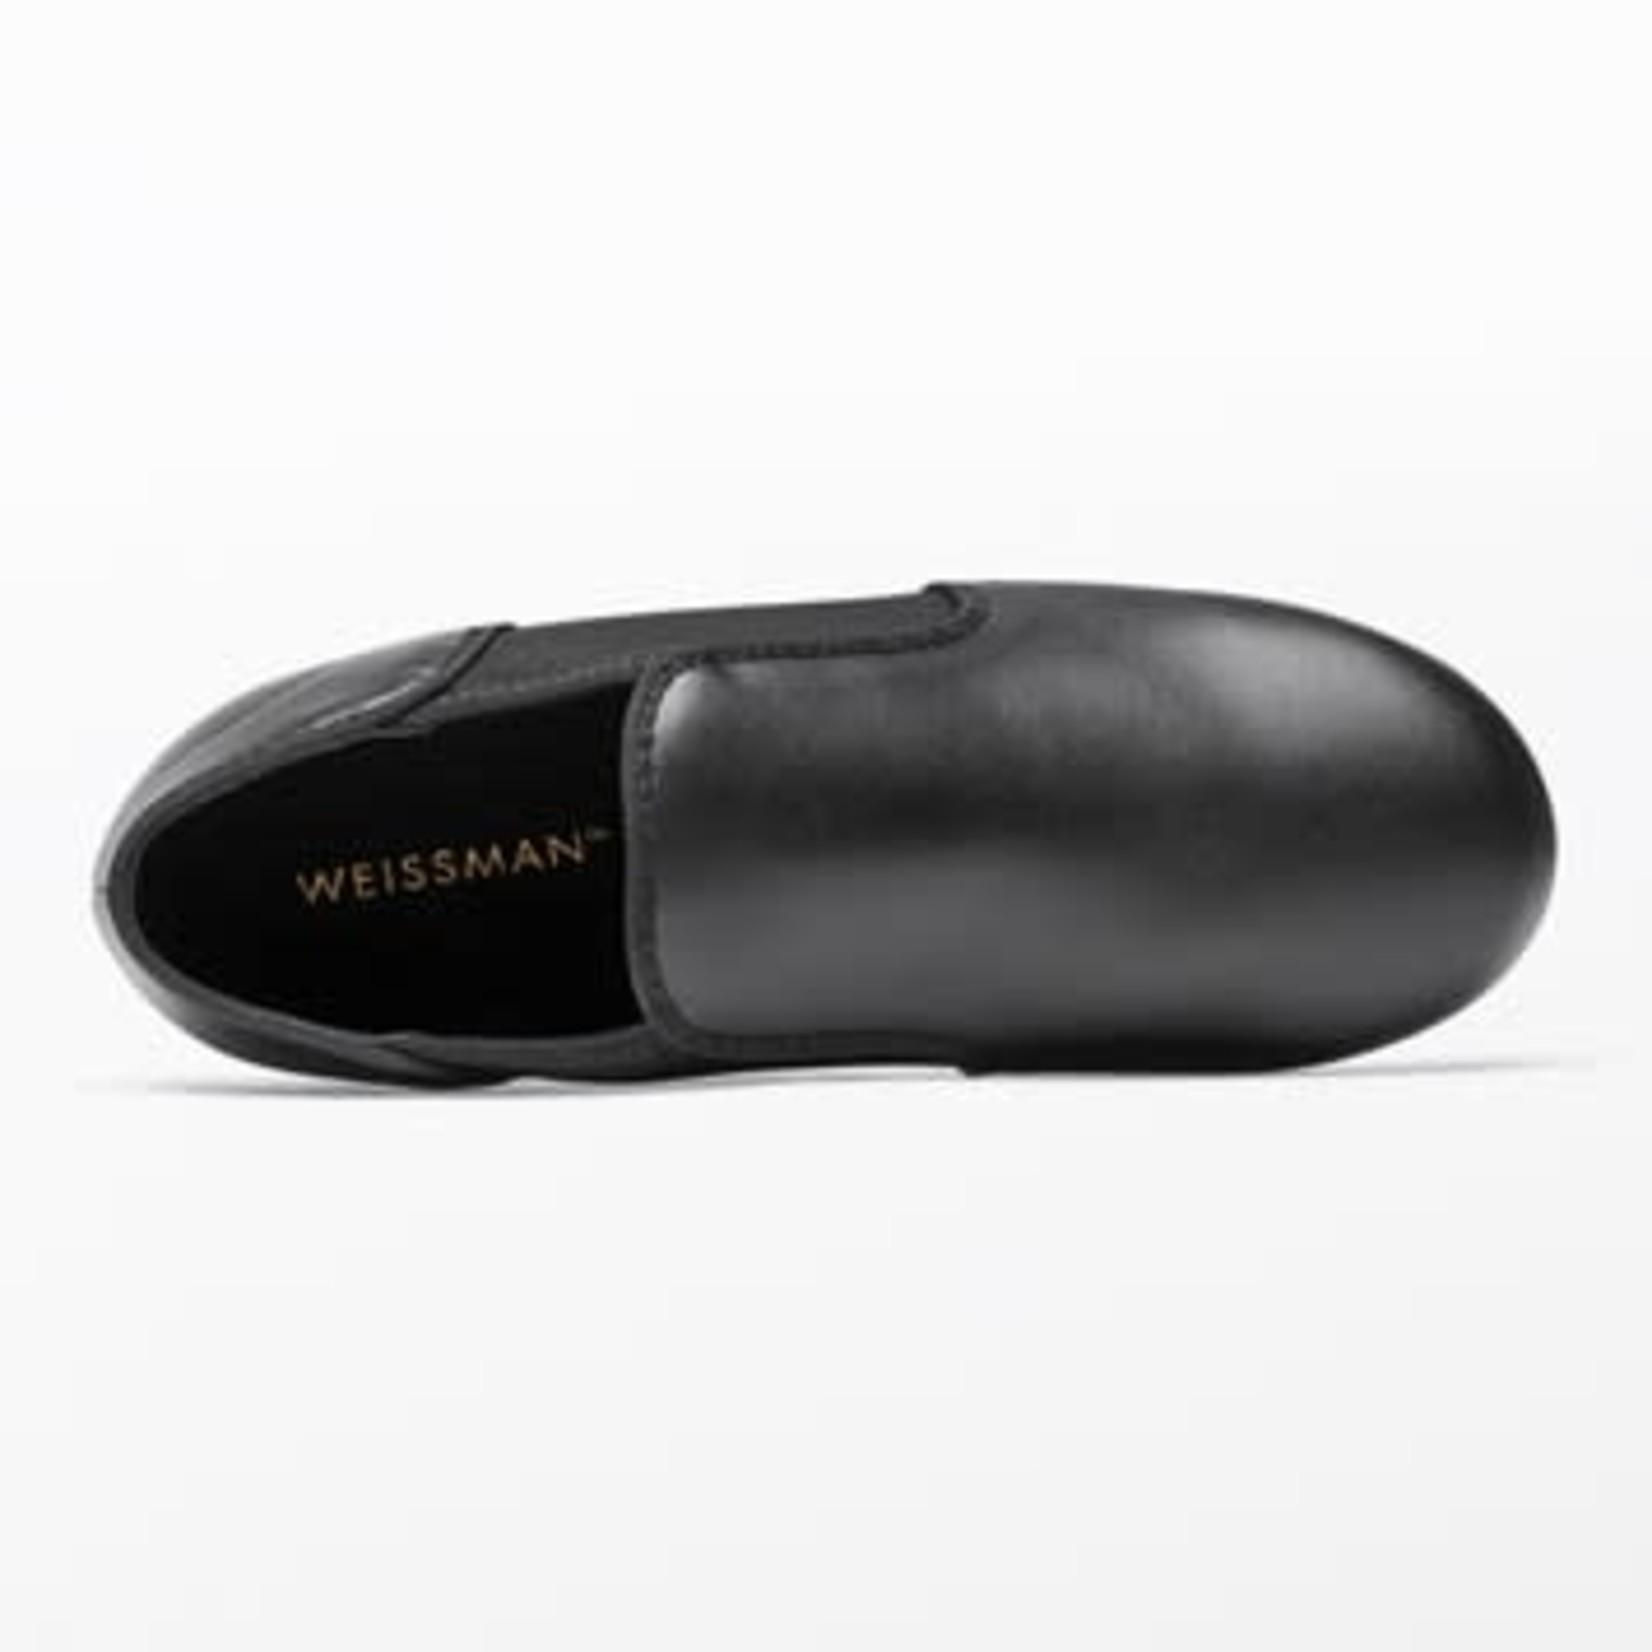 Weissman Weissman W1500 Adult Slip-On Tap Shoes